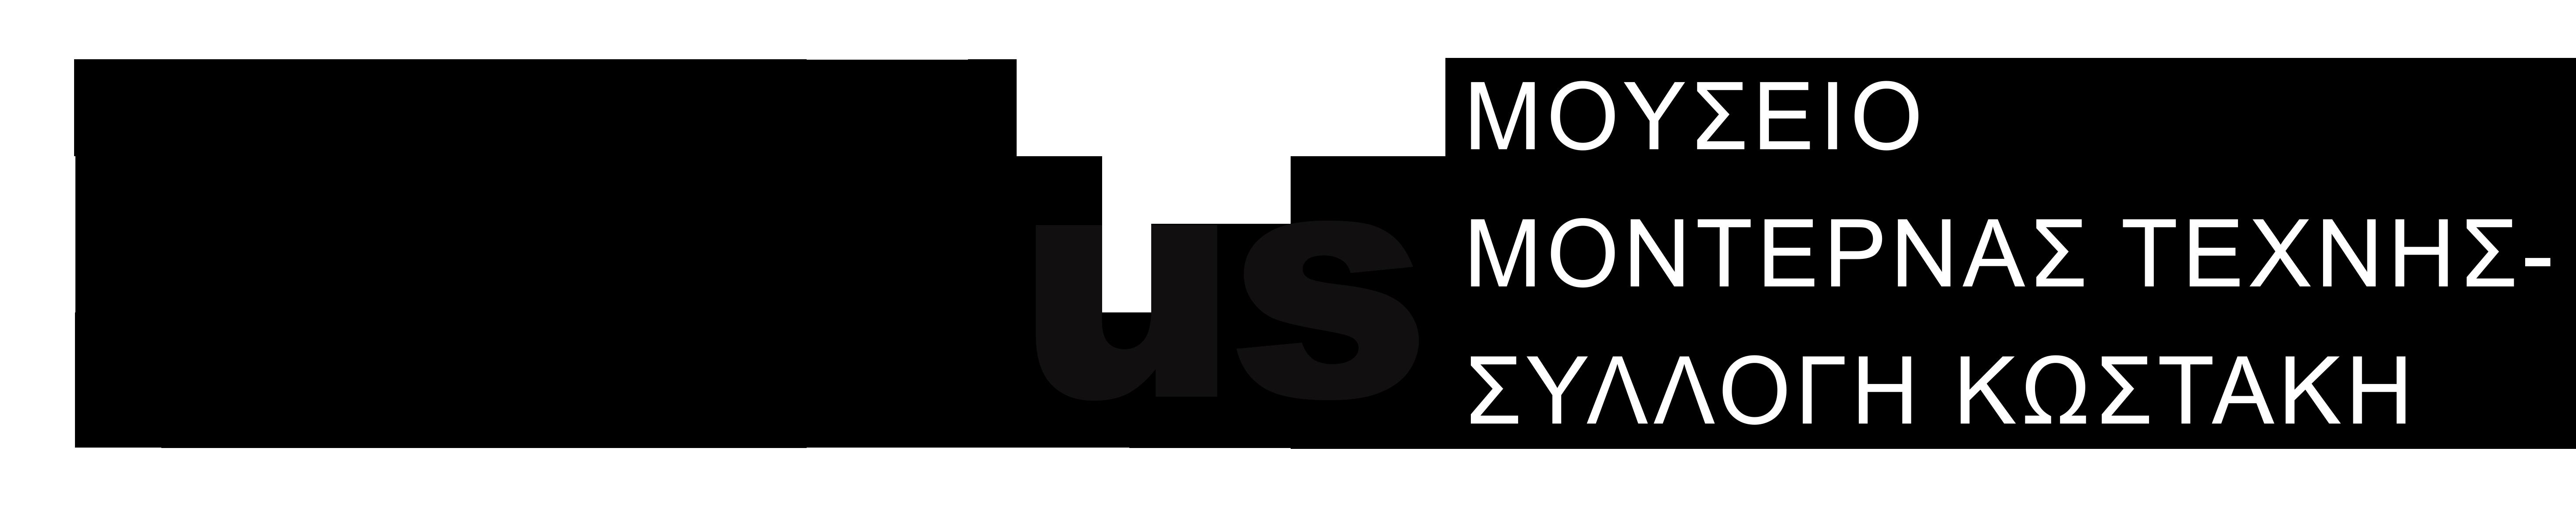 MOMus-Μουσείο Μοντέρνας Τέχνης-Συλλογή Κωστάκη